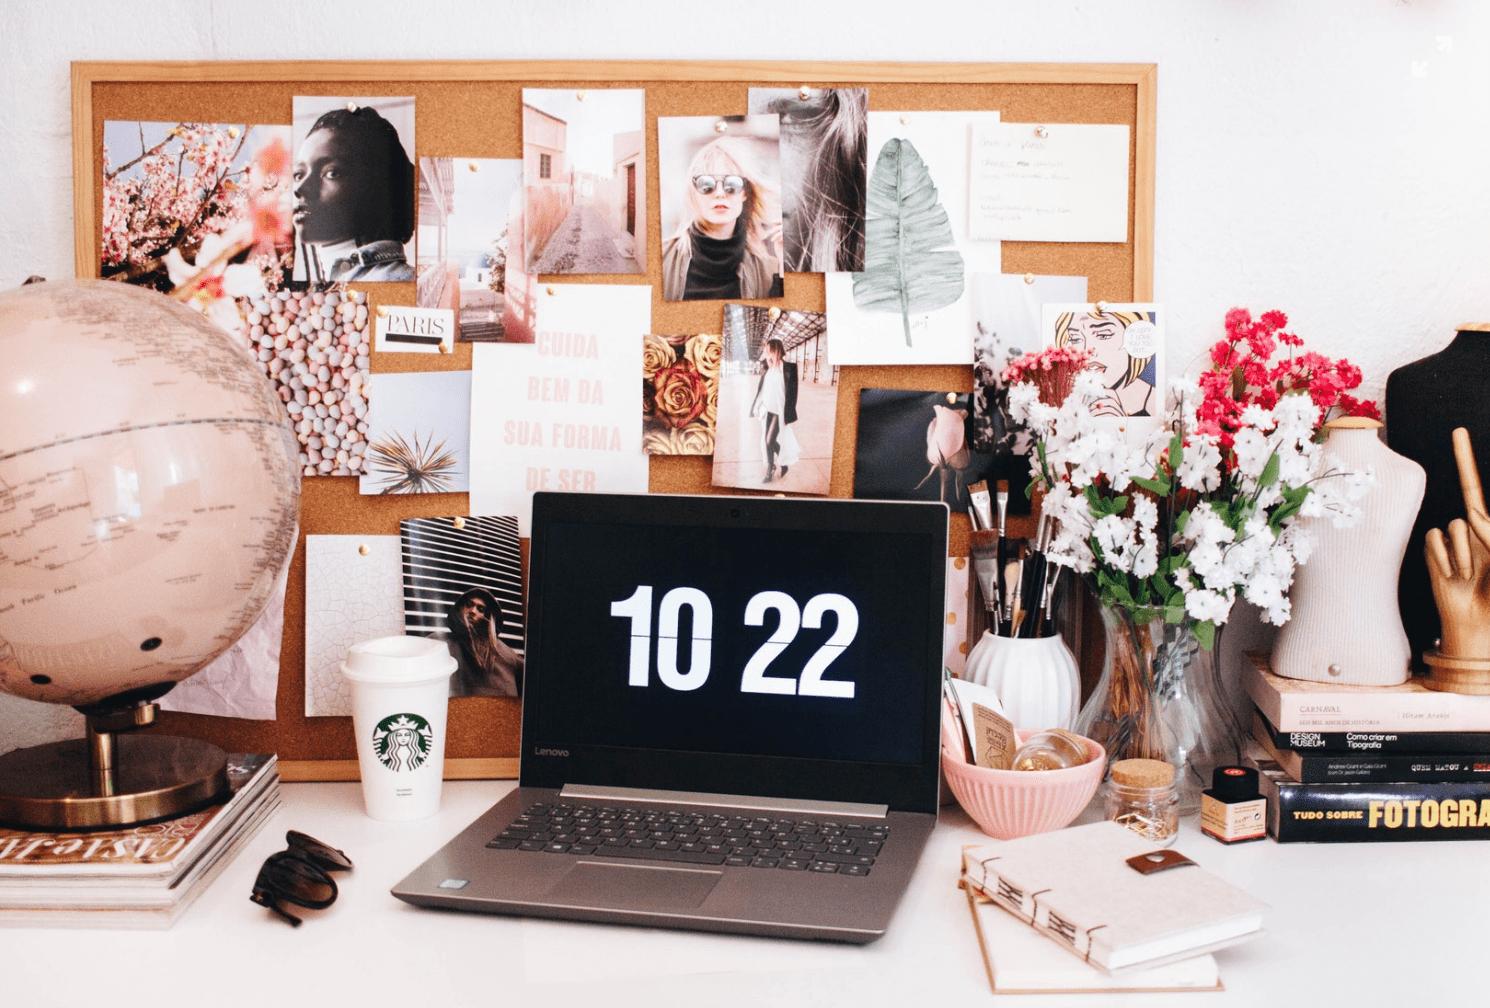 Desk organizers are a great office organization idea!